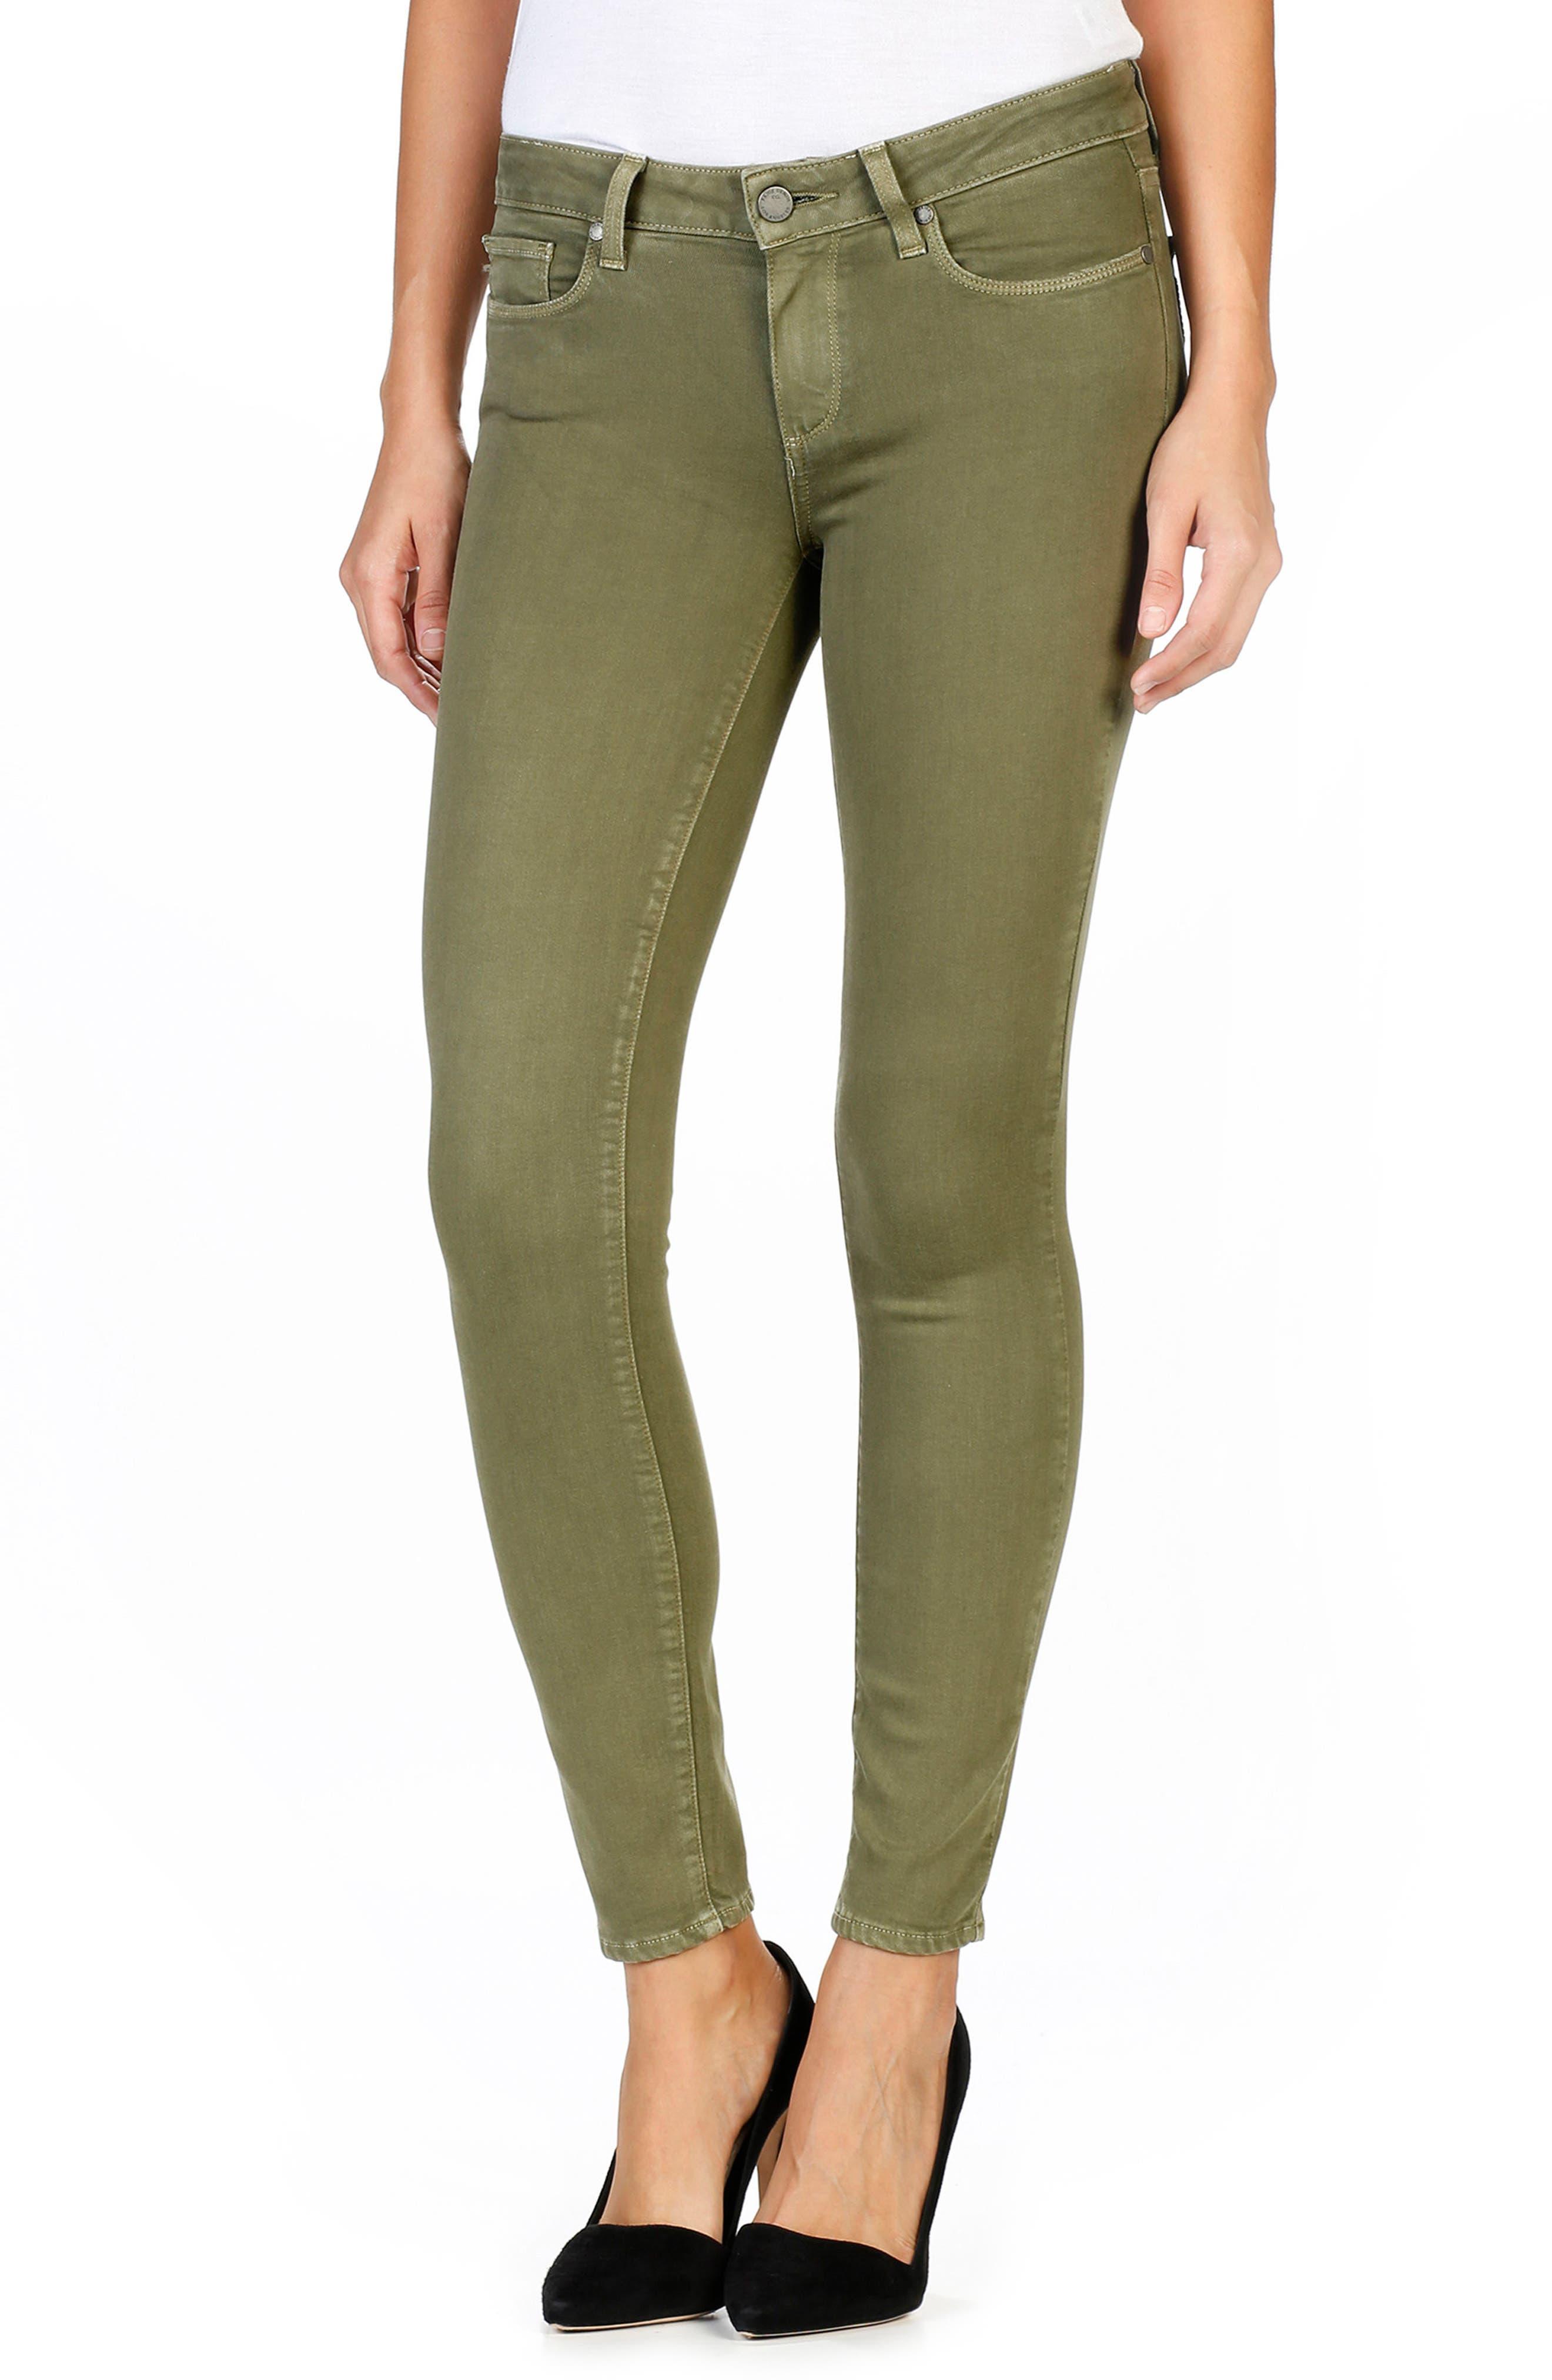 Transcend - Verdugo Ankle Skinny Jeans,                             Alternate thumbnail 2, color,                             300